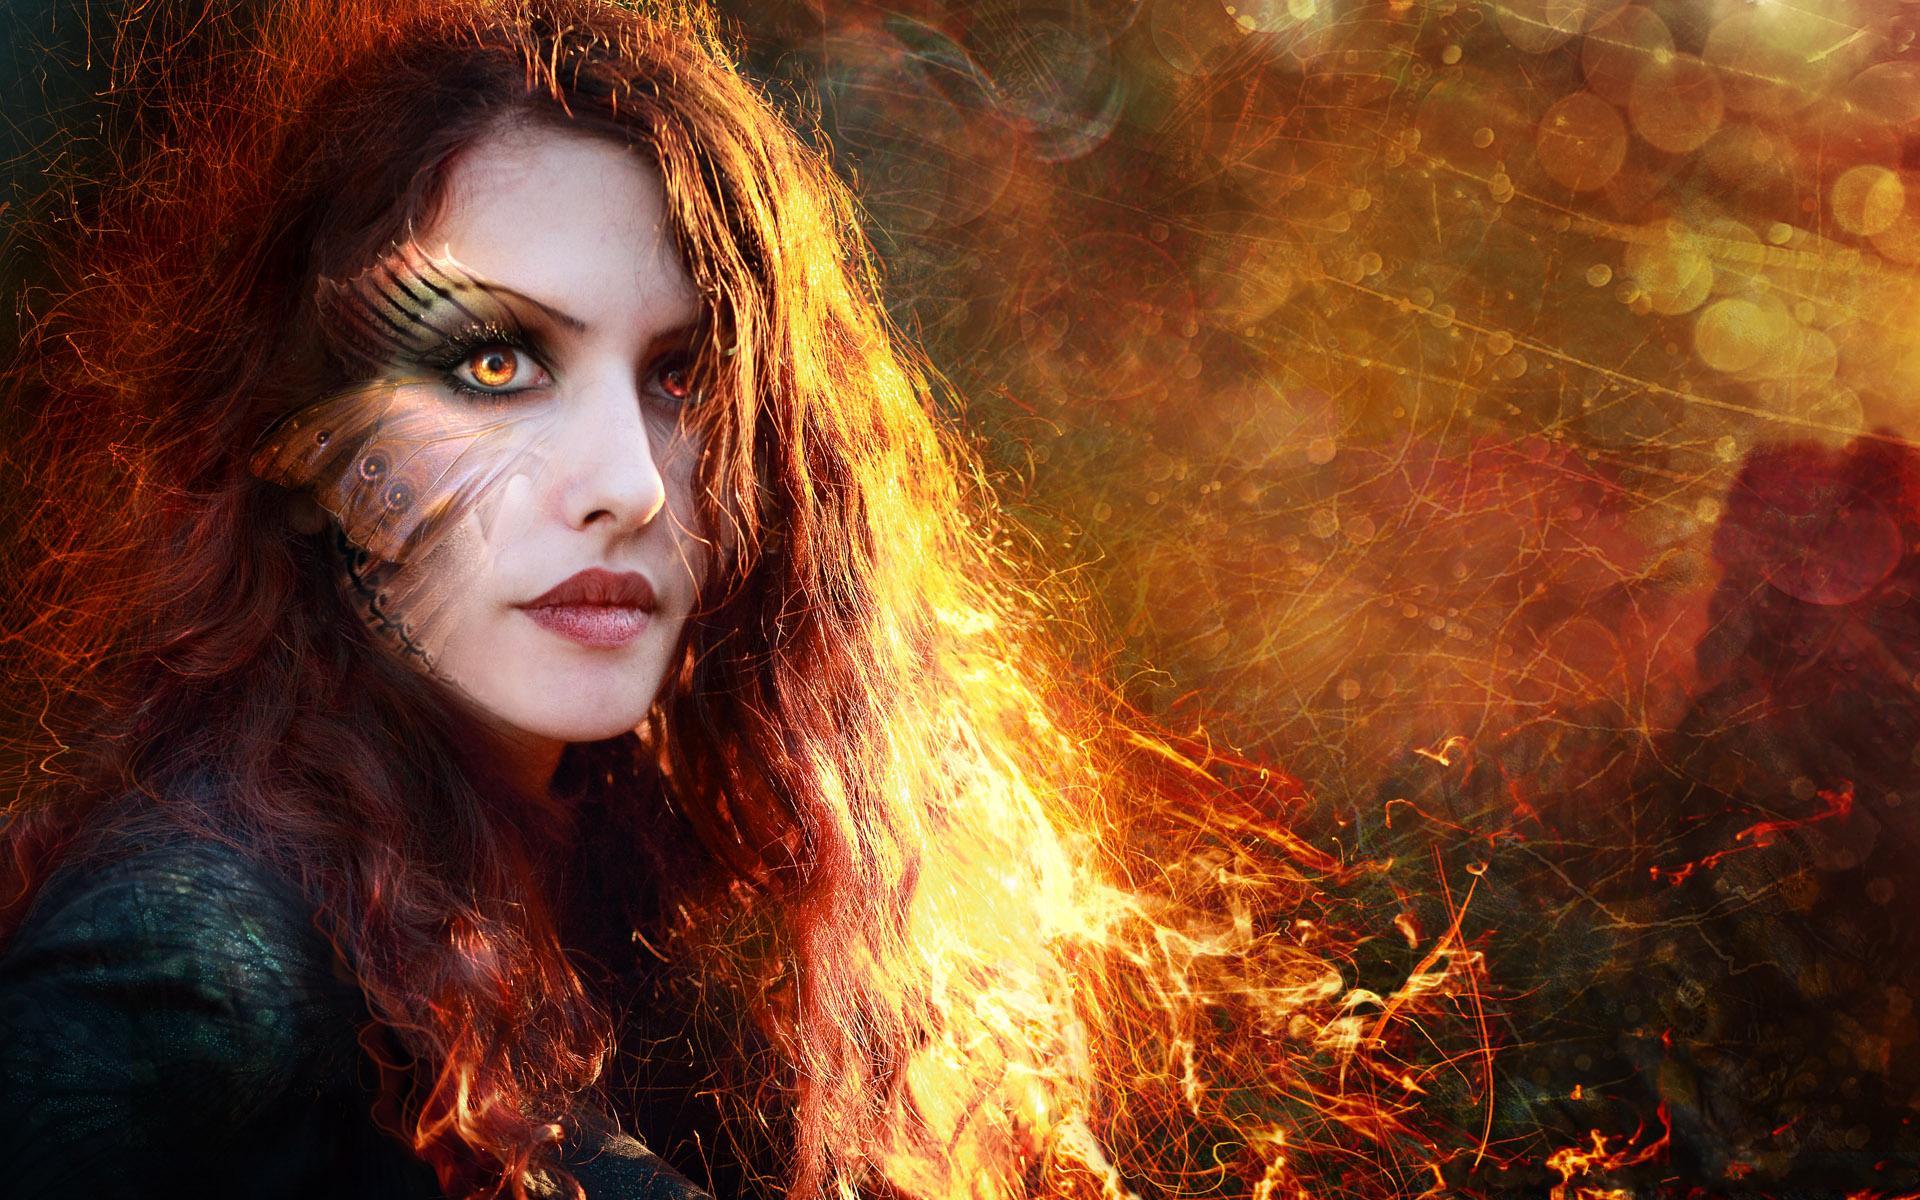 Women: Model, Manipulation, Makeup